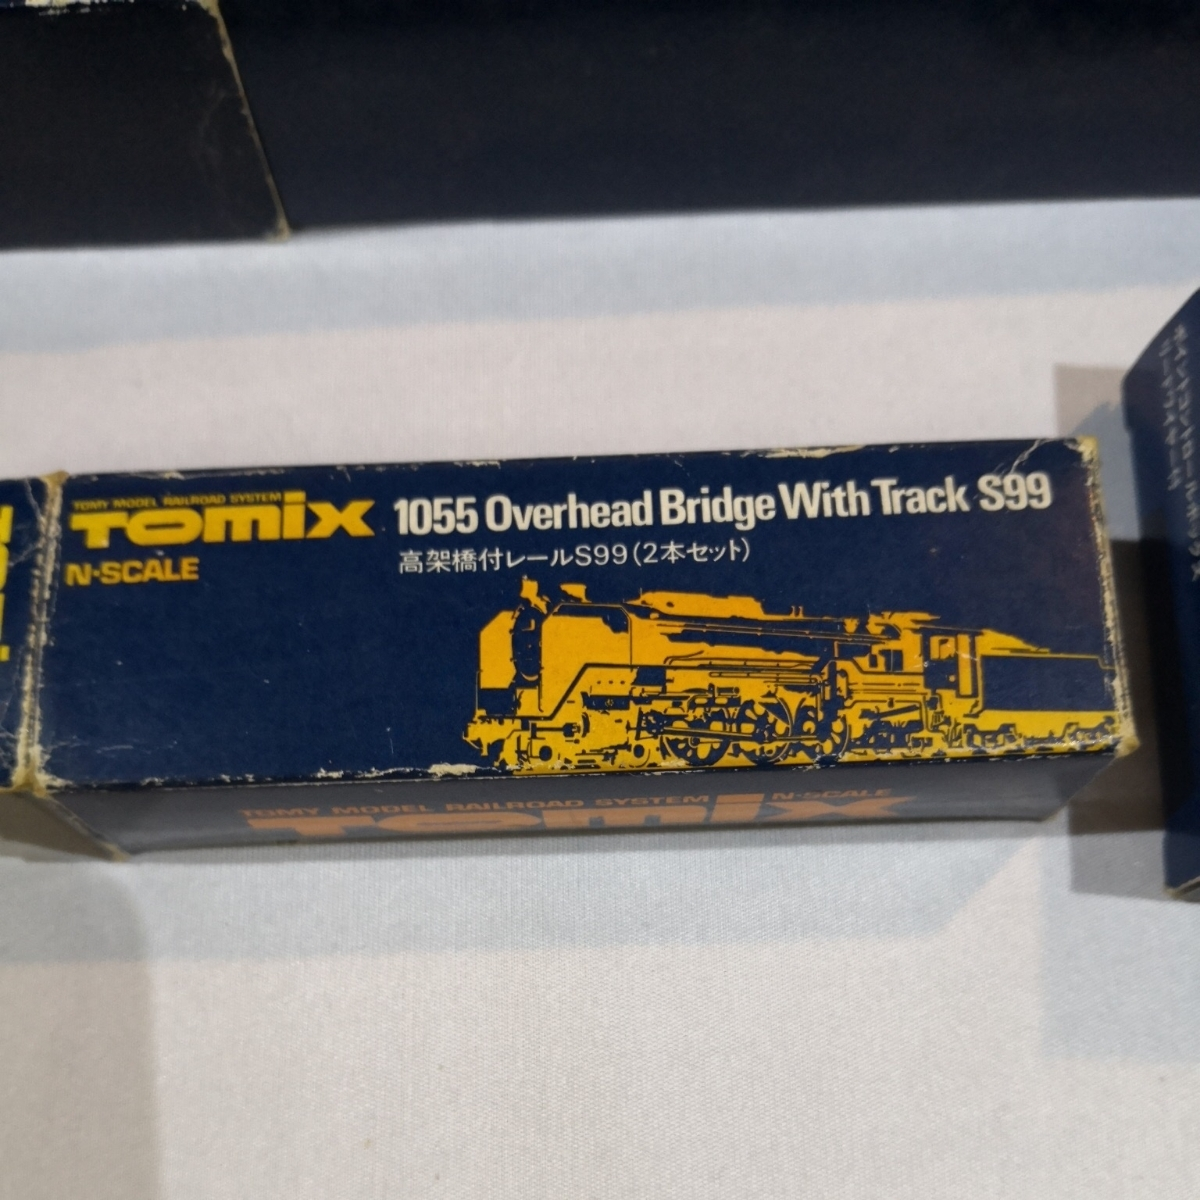 Nゲージ 鉄道模型用 レール ポイント切り替え部品 陸橋 など ジオラマ用部品 大量一括 TOMIX KATO _画像6